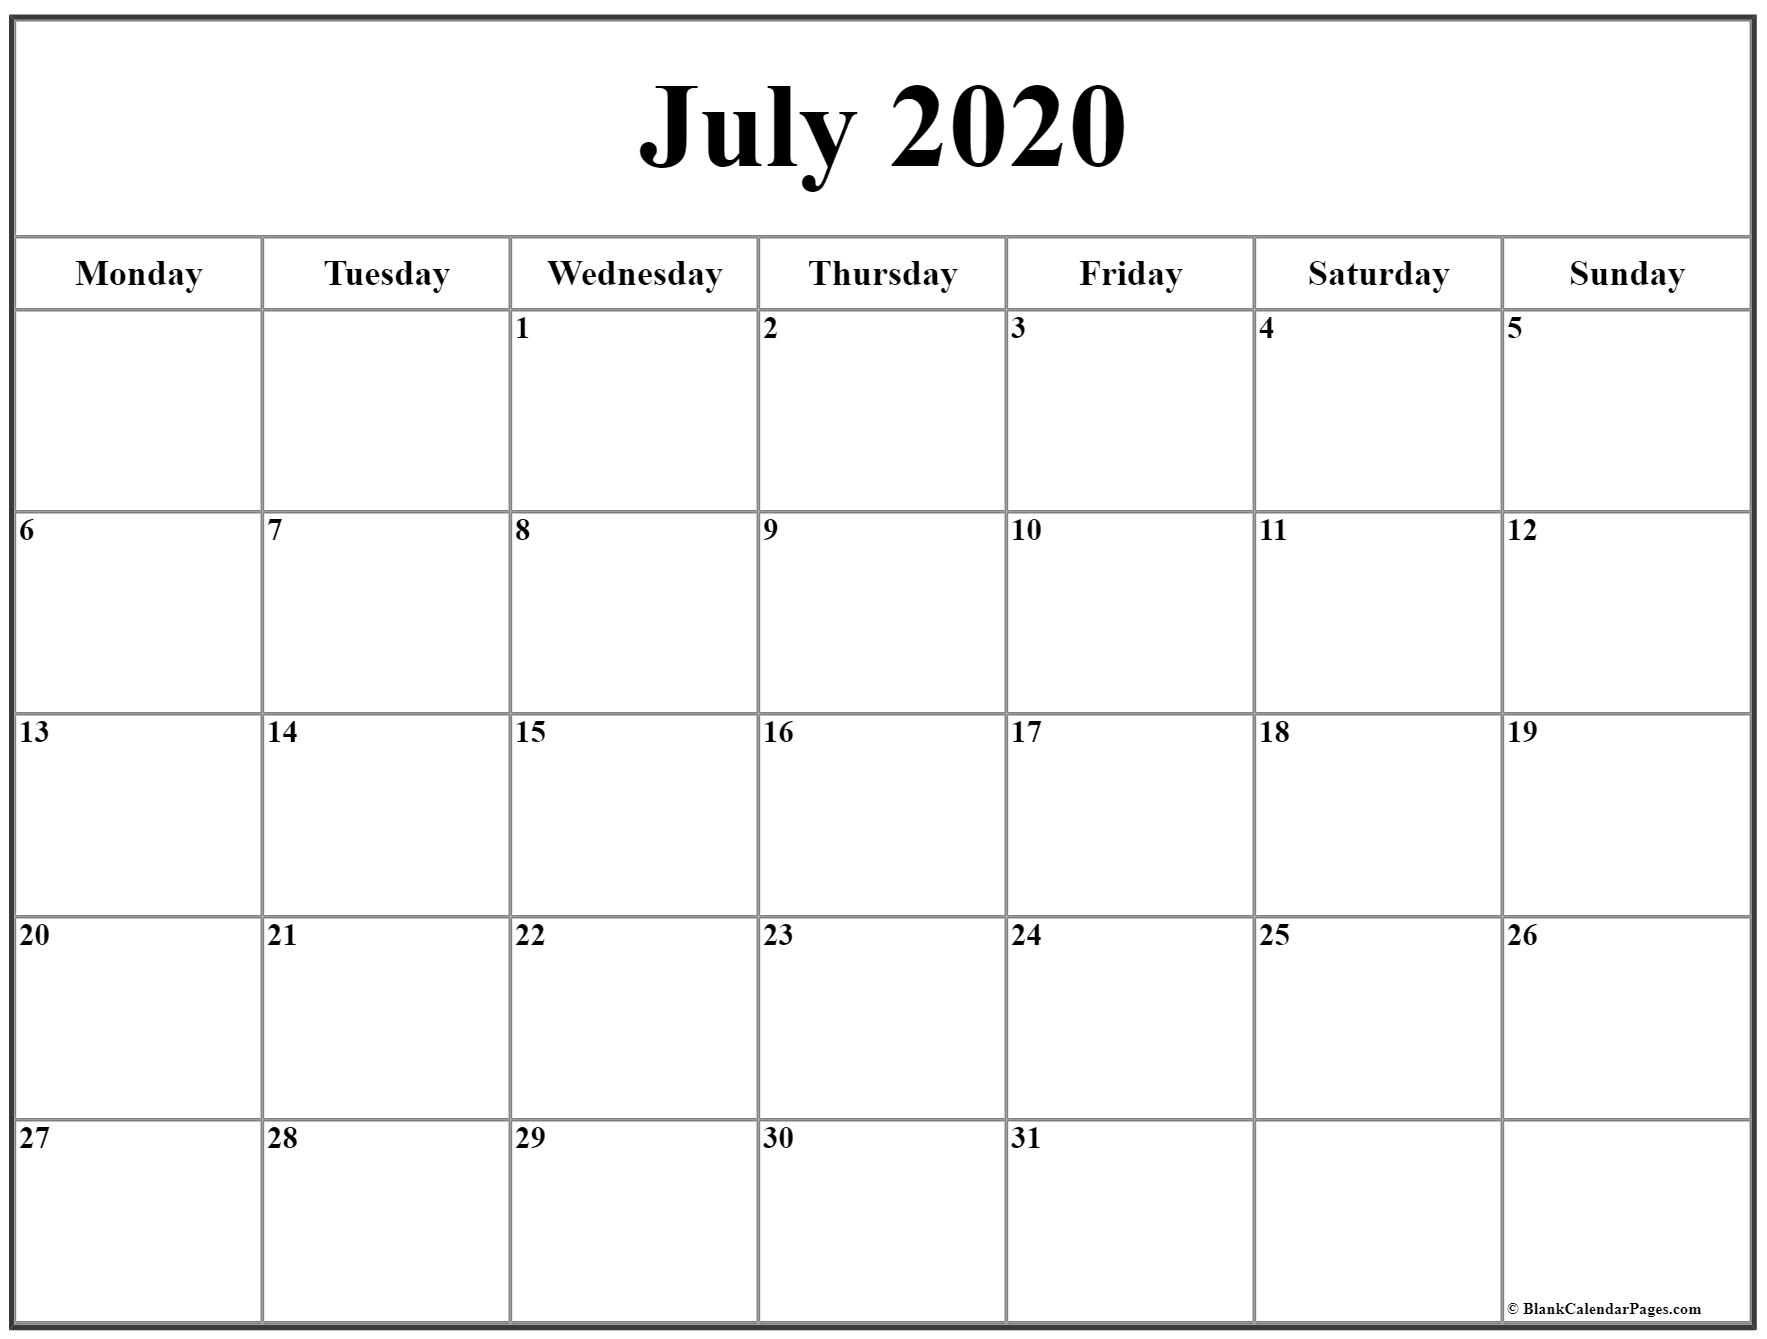 July 2020 Monday Calendar | Monday To Sunday with regard to 2020 Calendar Starting With Mondays